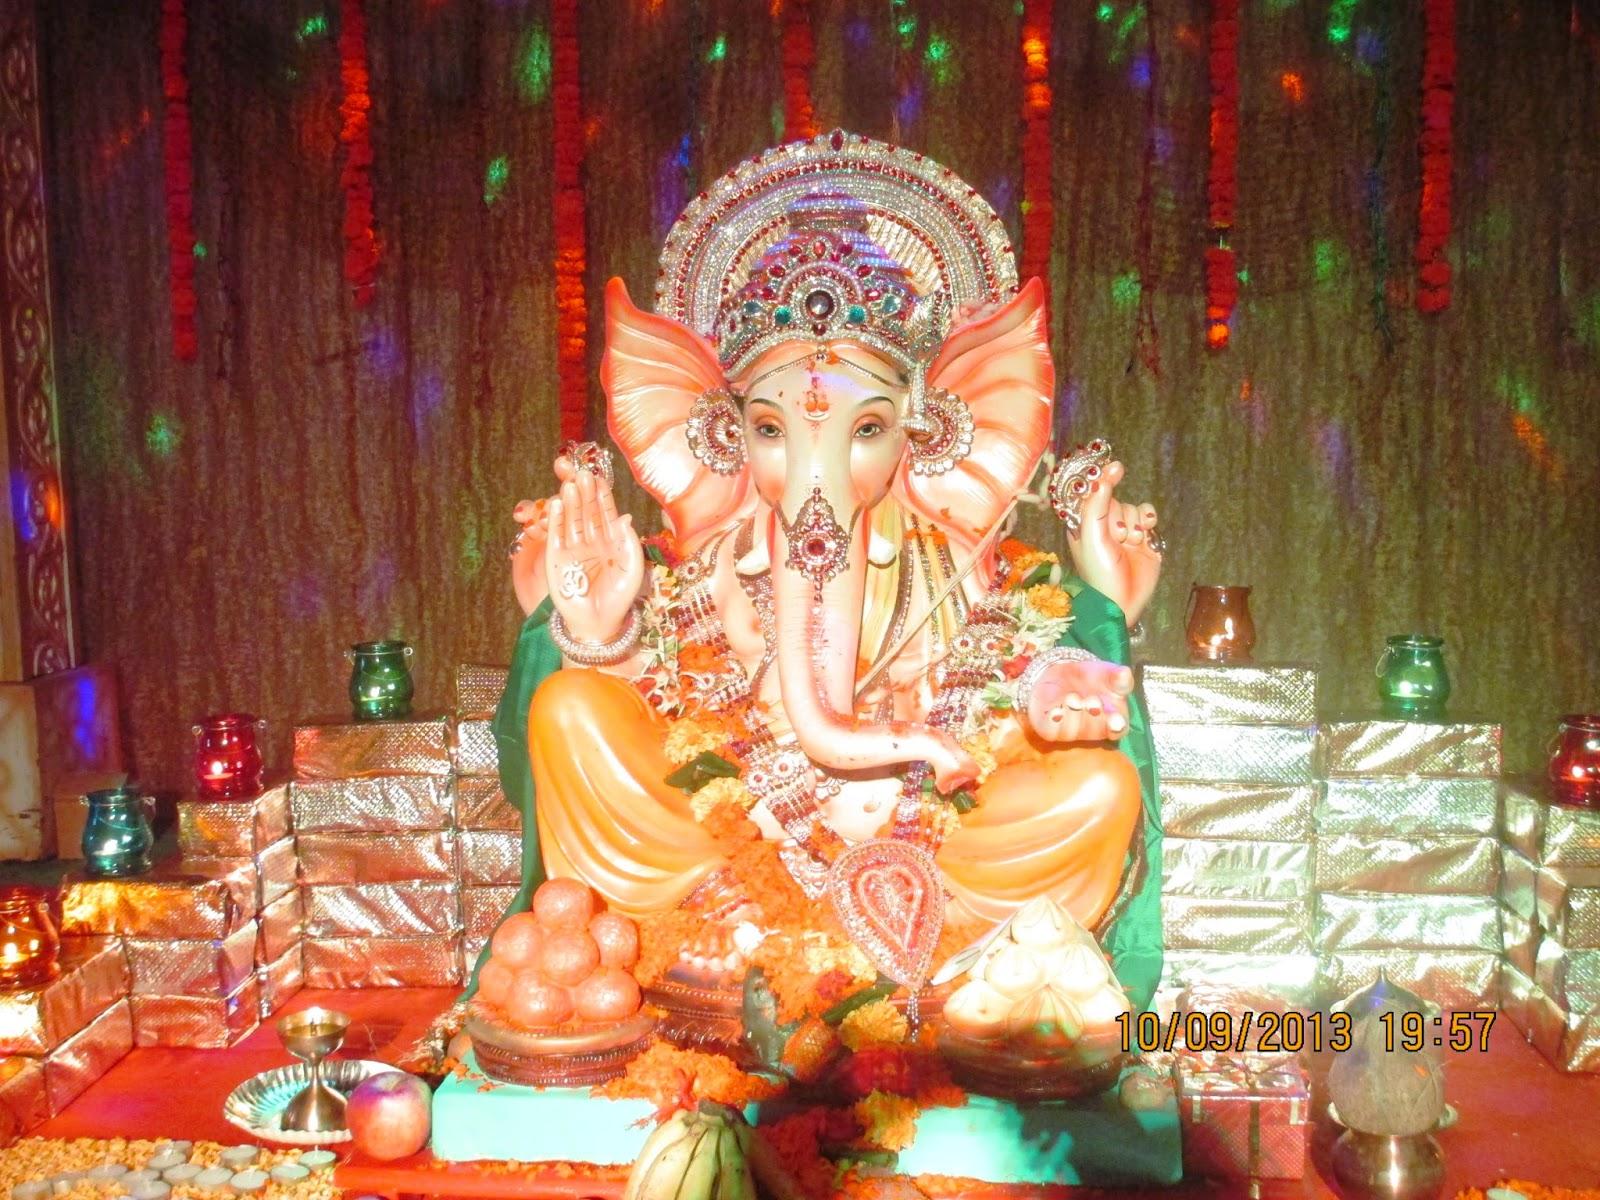 Ganesh Puja is known as Ganesh Chaturthi